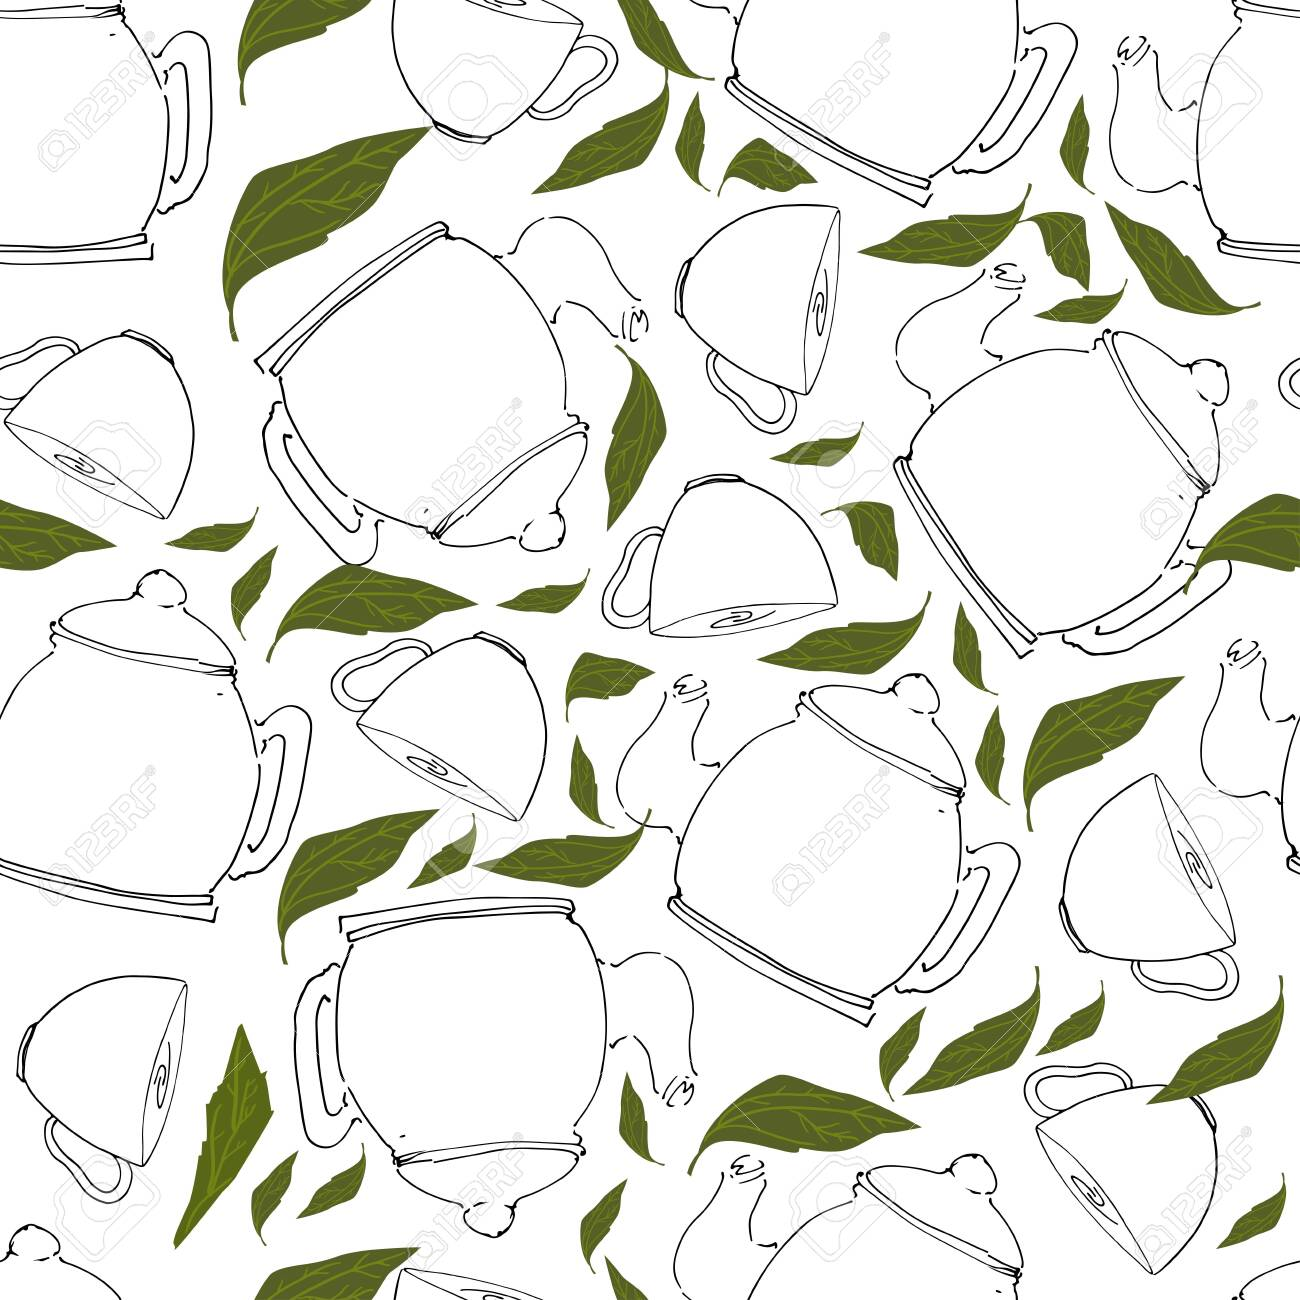 Tea pot hand drawn seamless pattern for your design: cafe menu, banner - 118664468